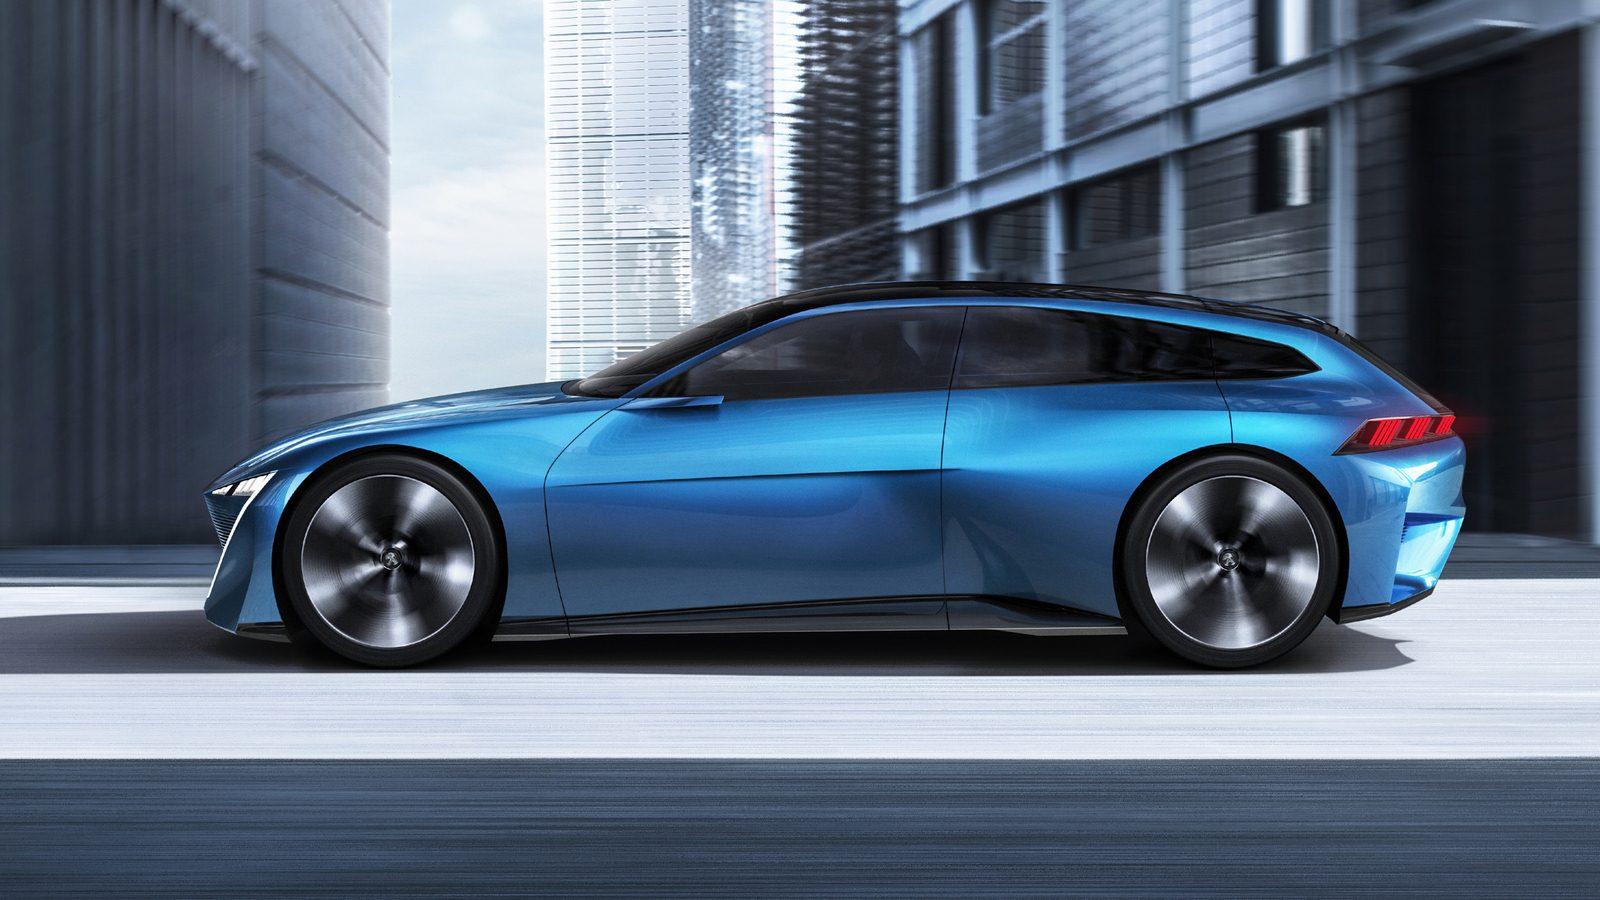 2017-Peugeot-Instinct-Concept-15